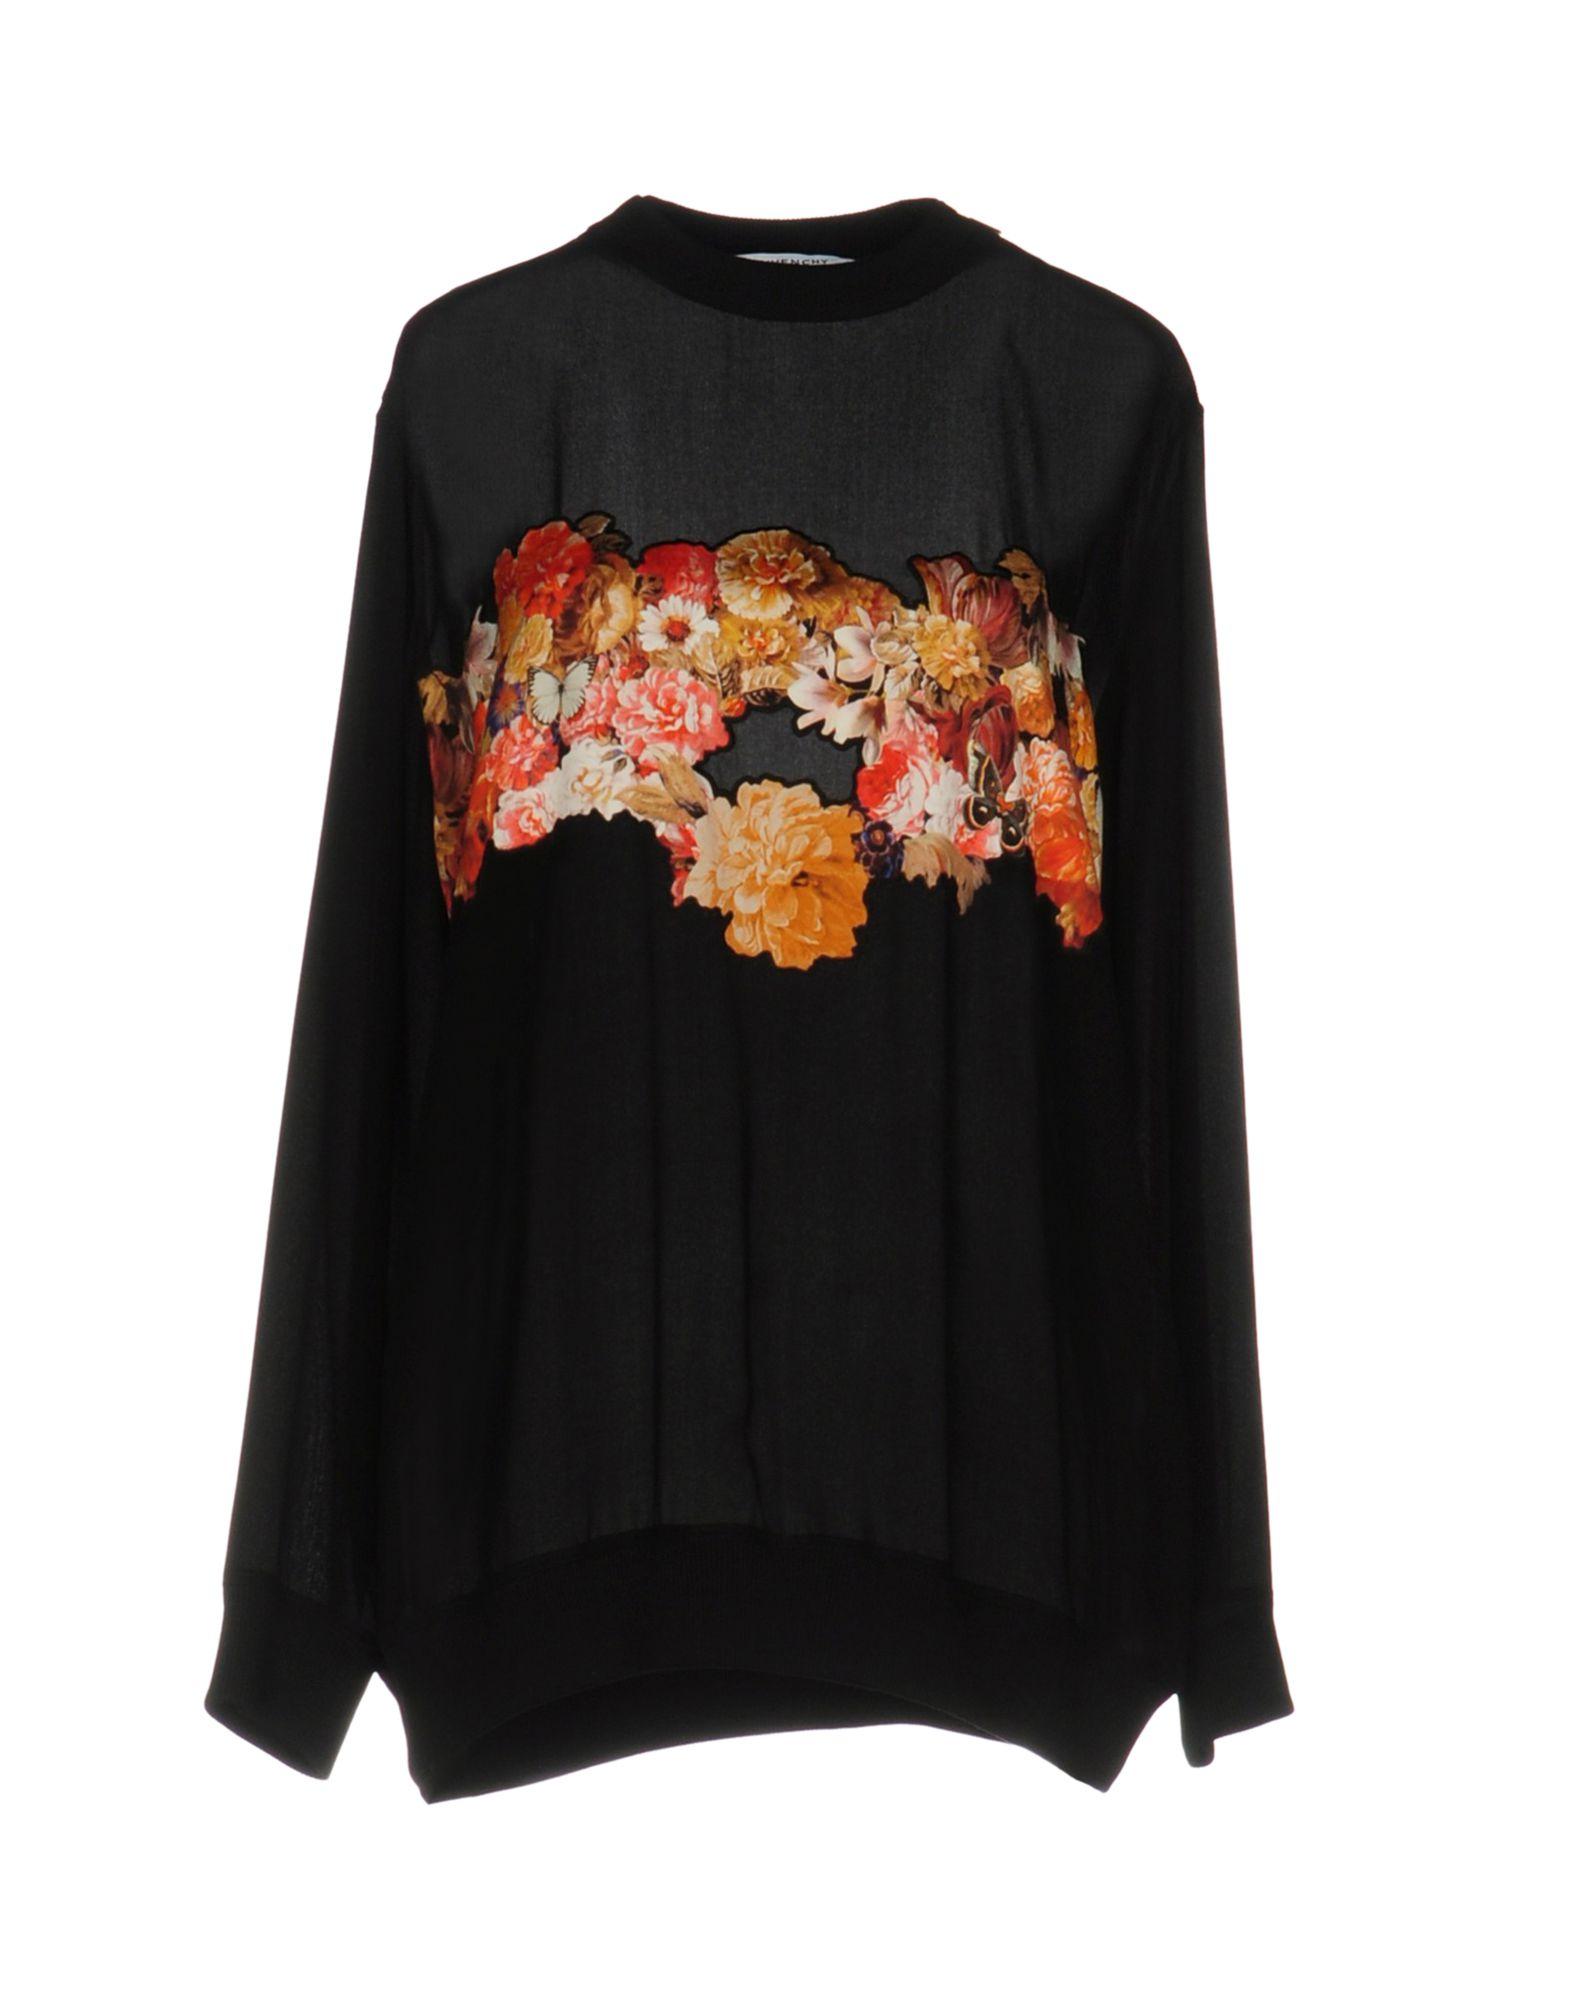 Givenchy Silks Blouse